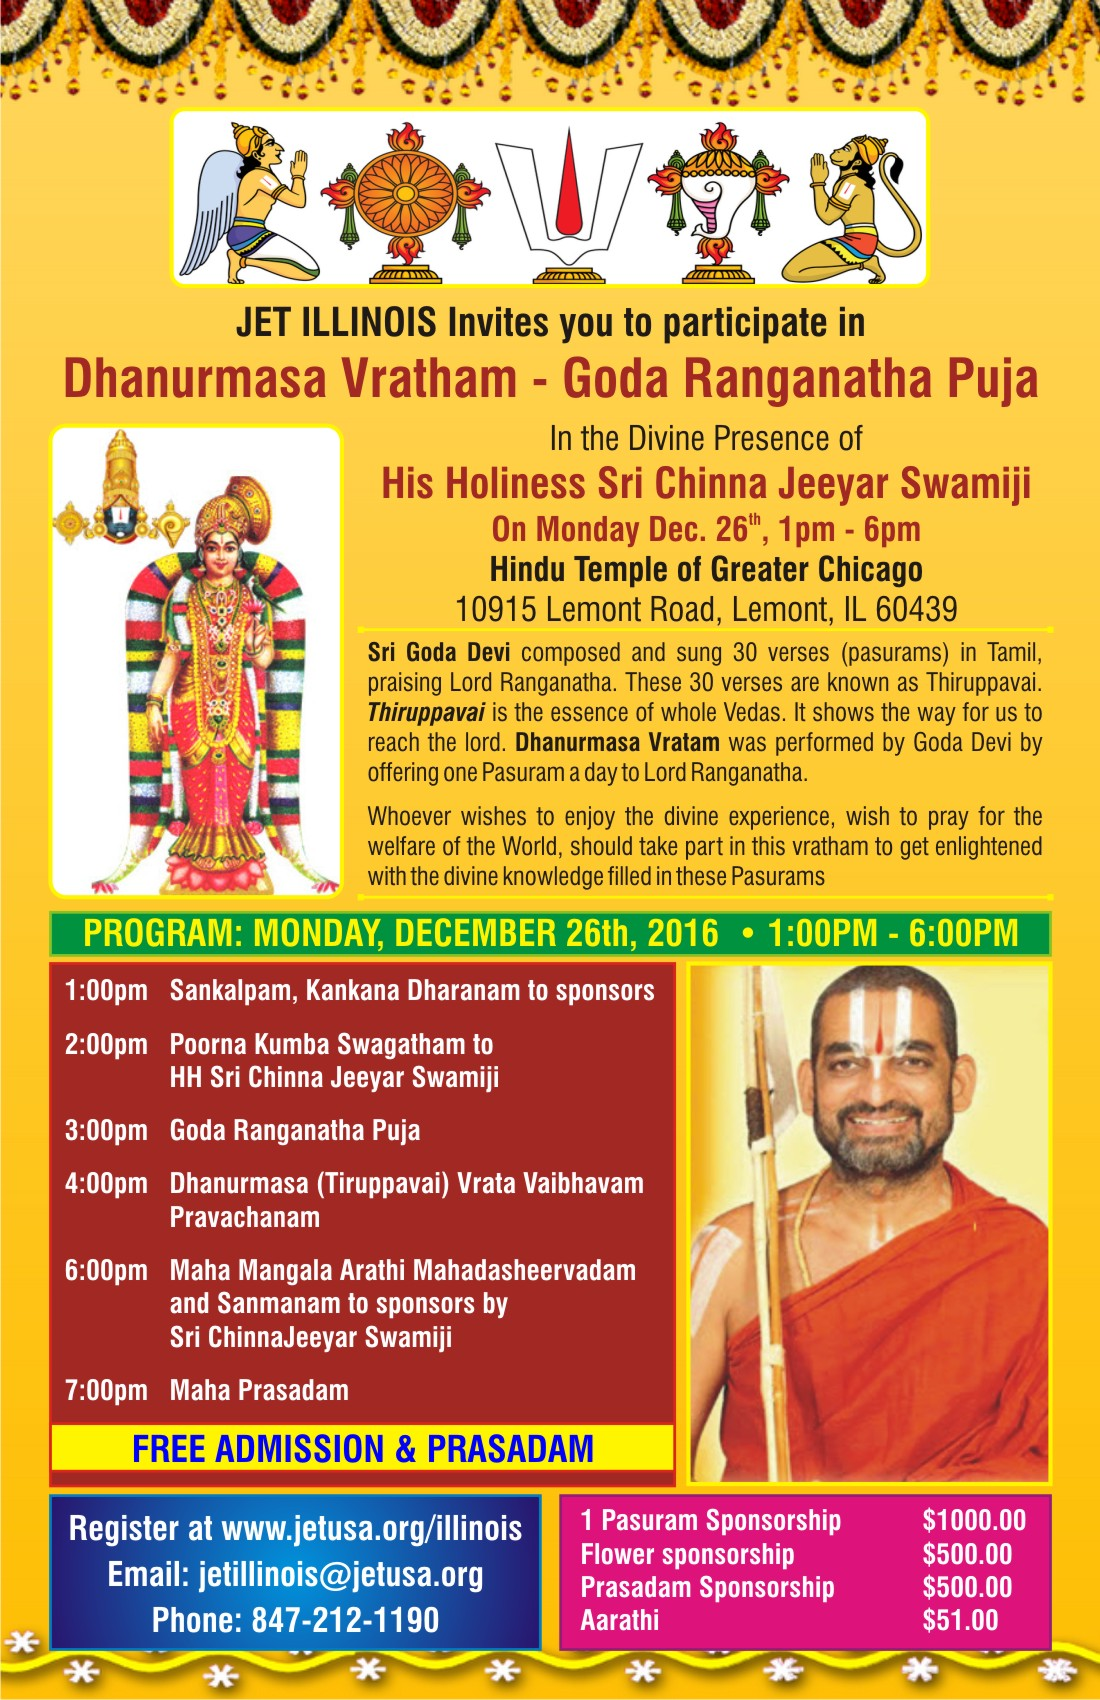 Dhanurmasam with HH Chinna Jeeyar Swamiji